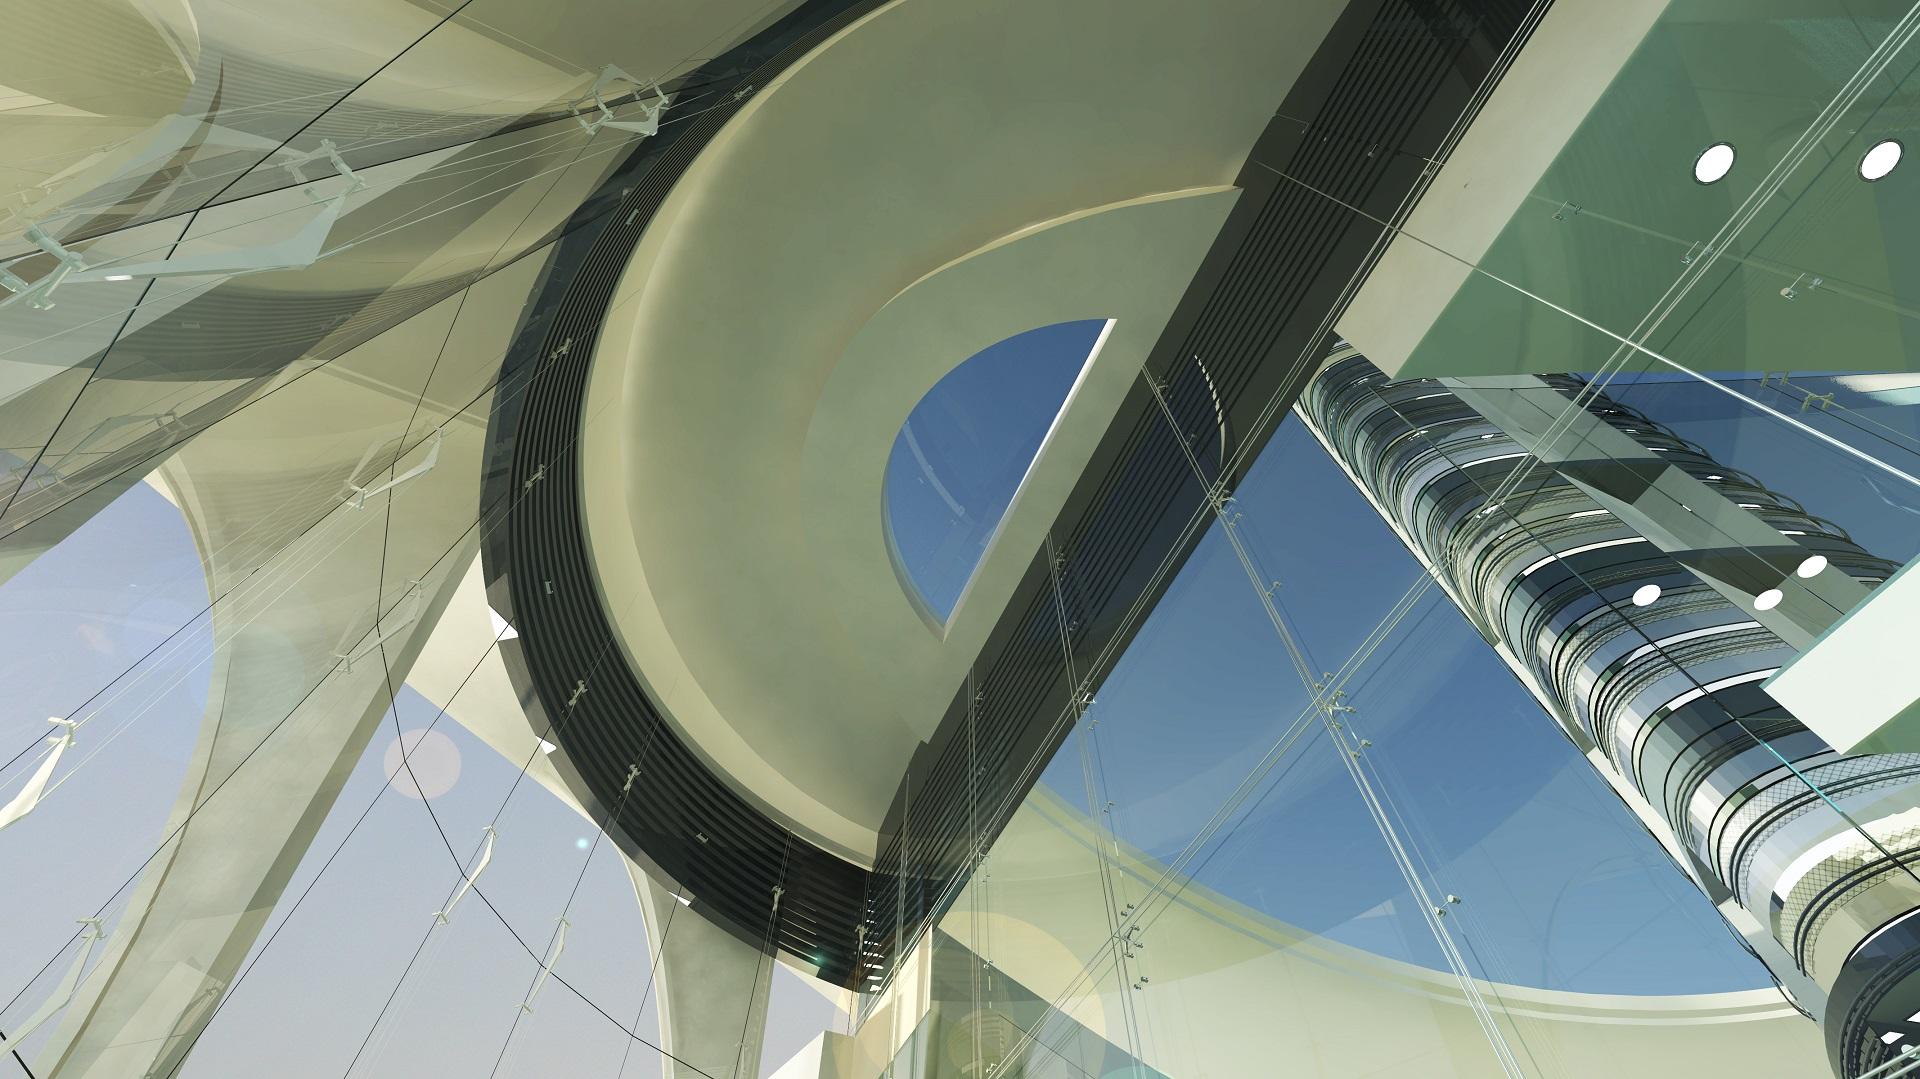 FIA Control LandSide Entrance Interior View